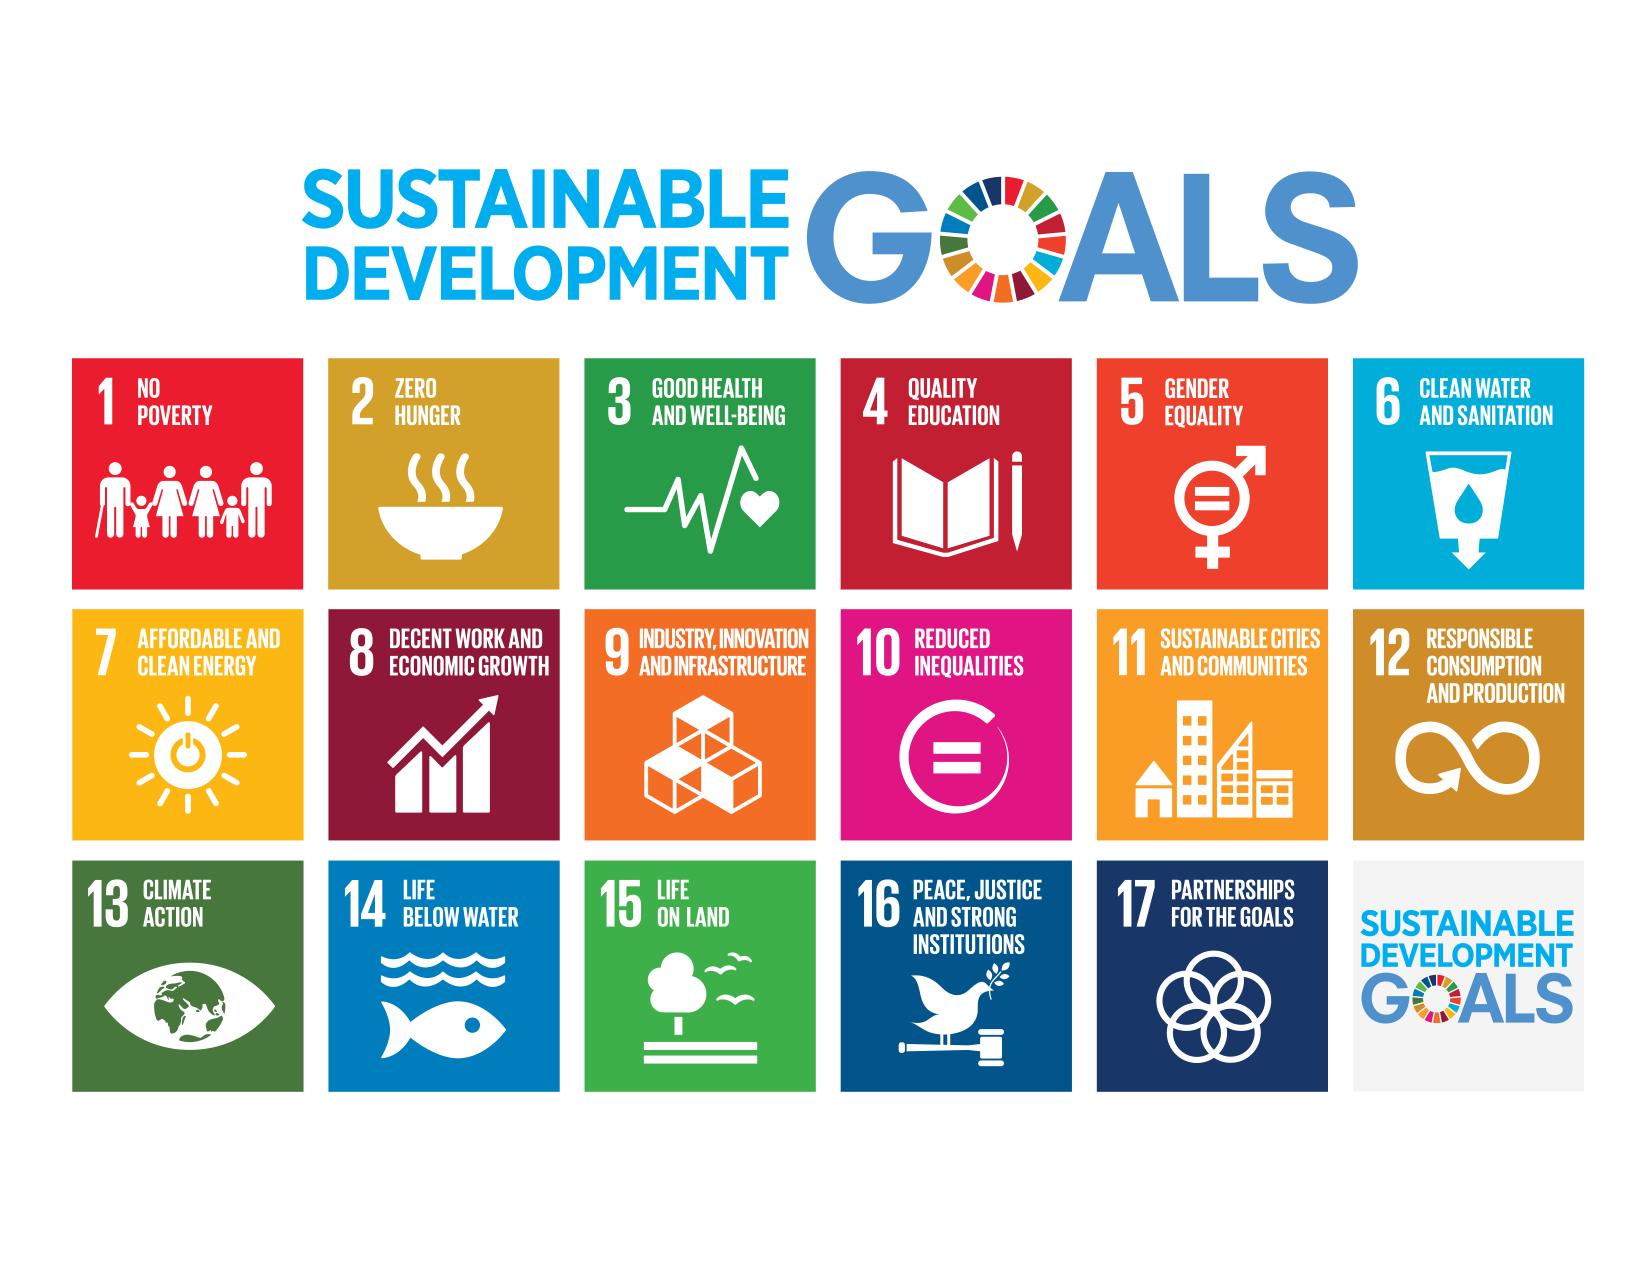 The UN HLPF 2018: Reviewing Progress towards Global Sustainable Development